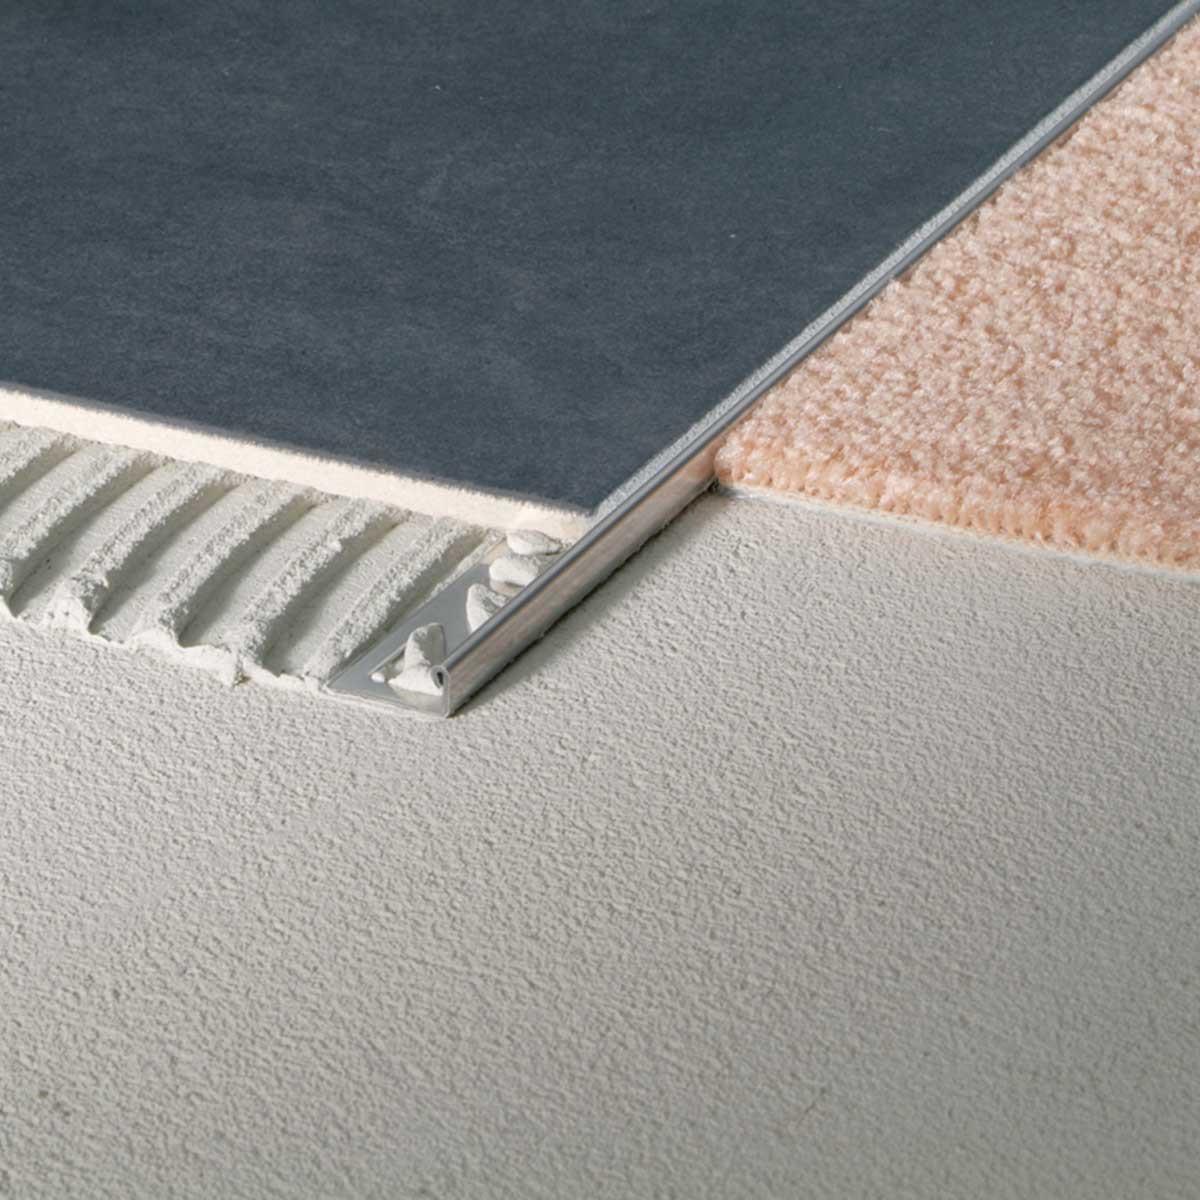 Blanke aluminum edge protector trims contractors direct aluminum edge protector trims blanke aluminum edge protector trims dailygadgetfo Gallery